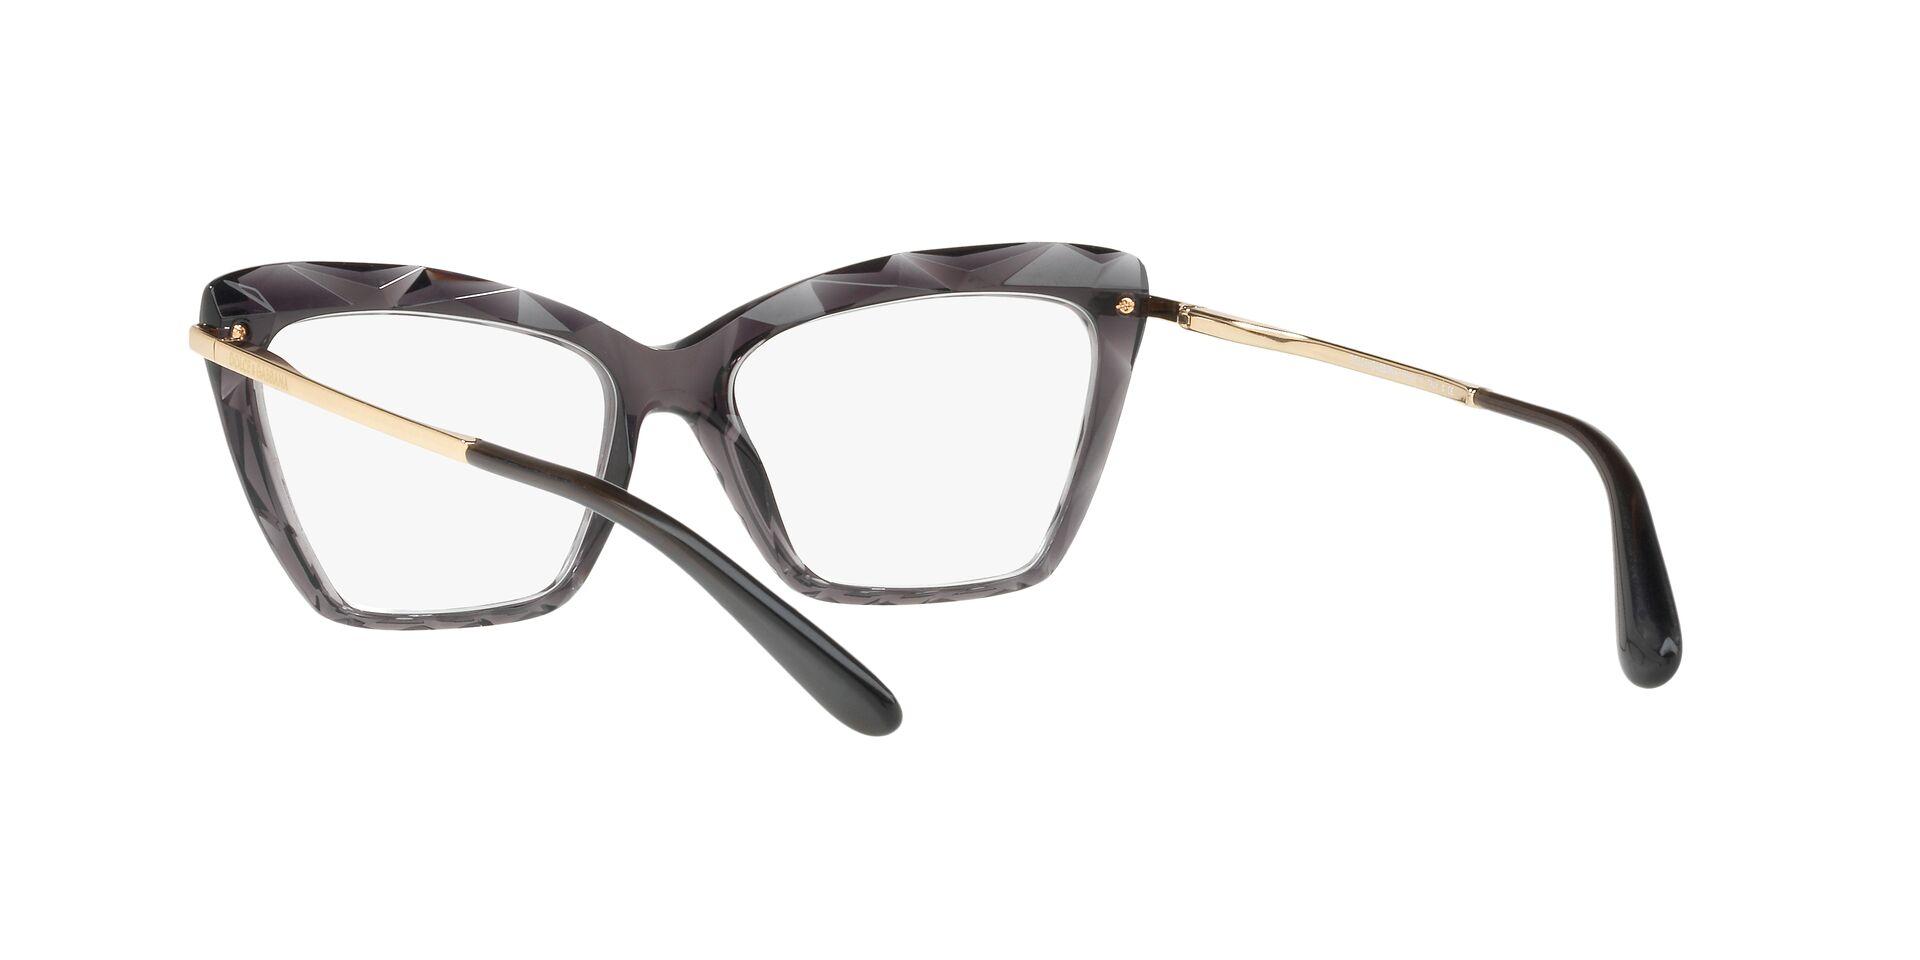 Óculos de Grau Dolce & Gabbana DG5025 504 53